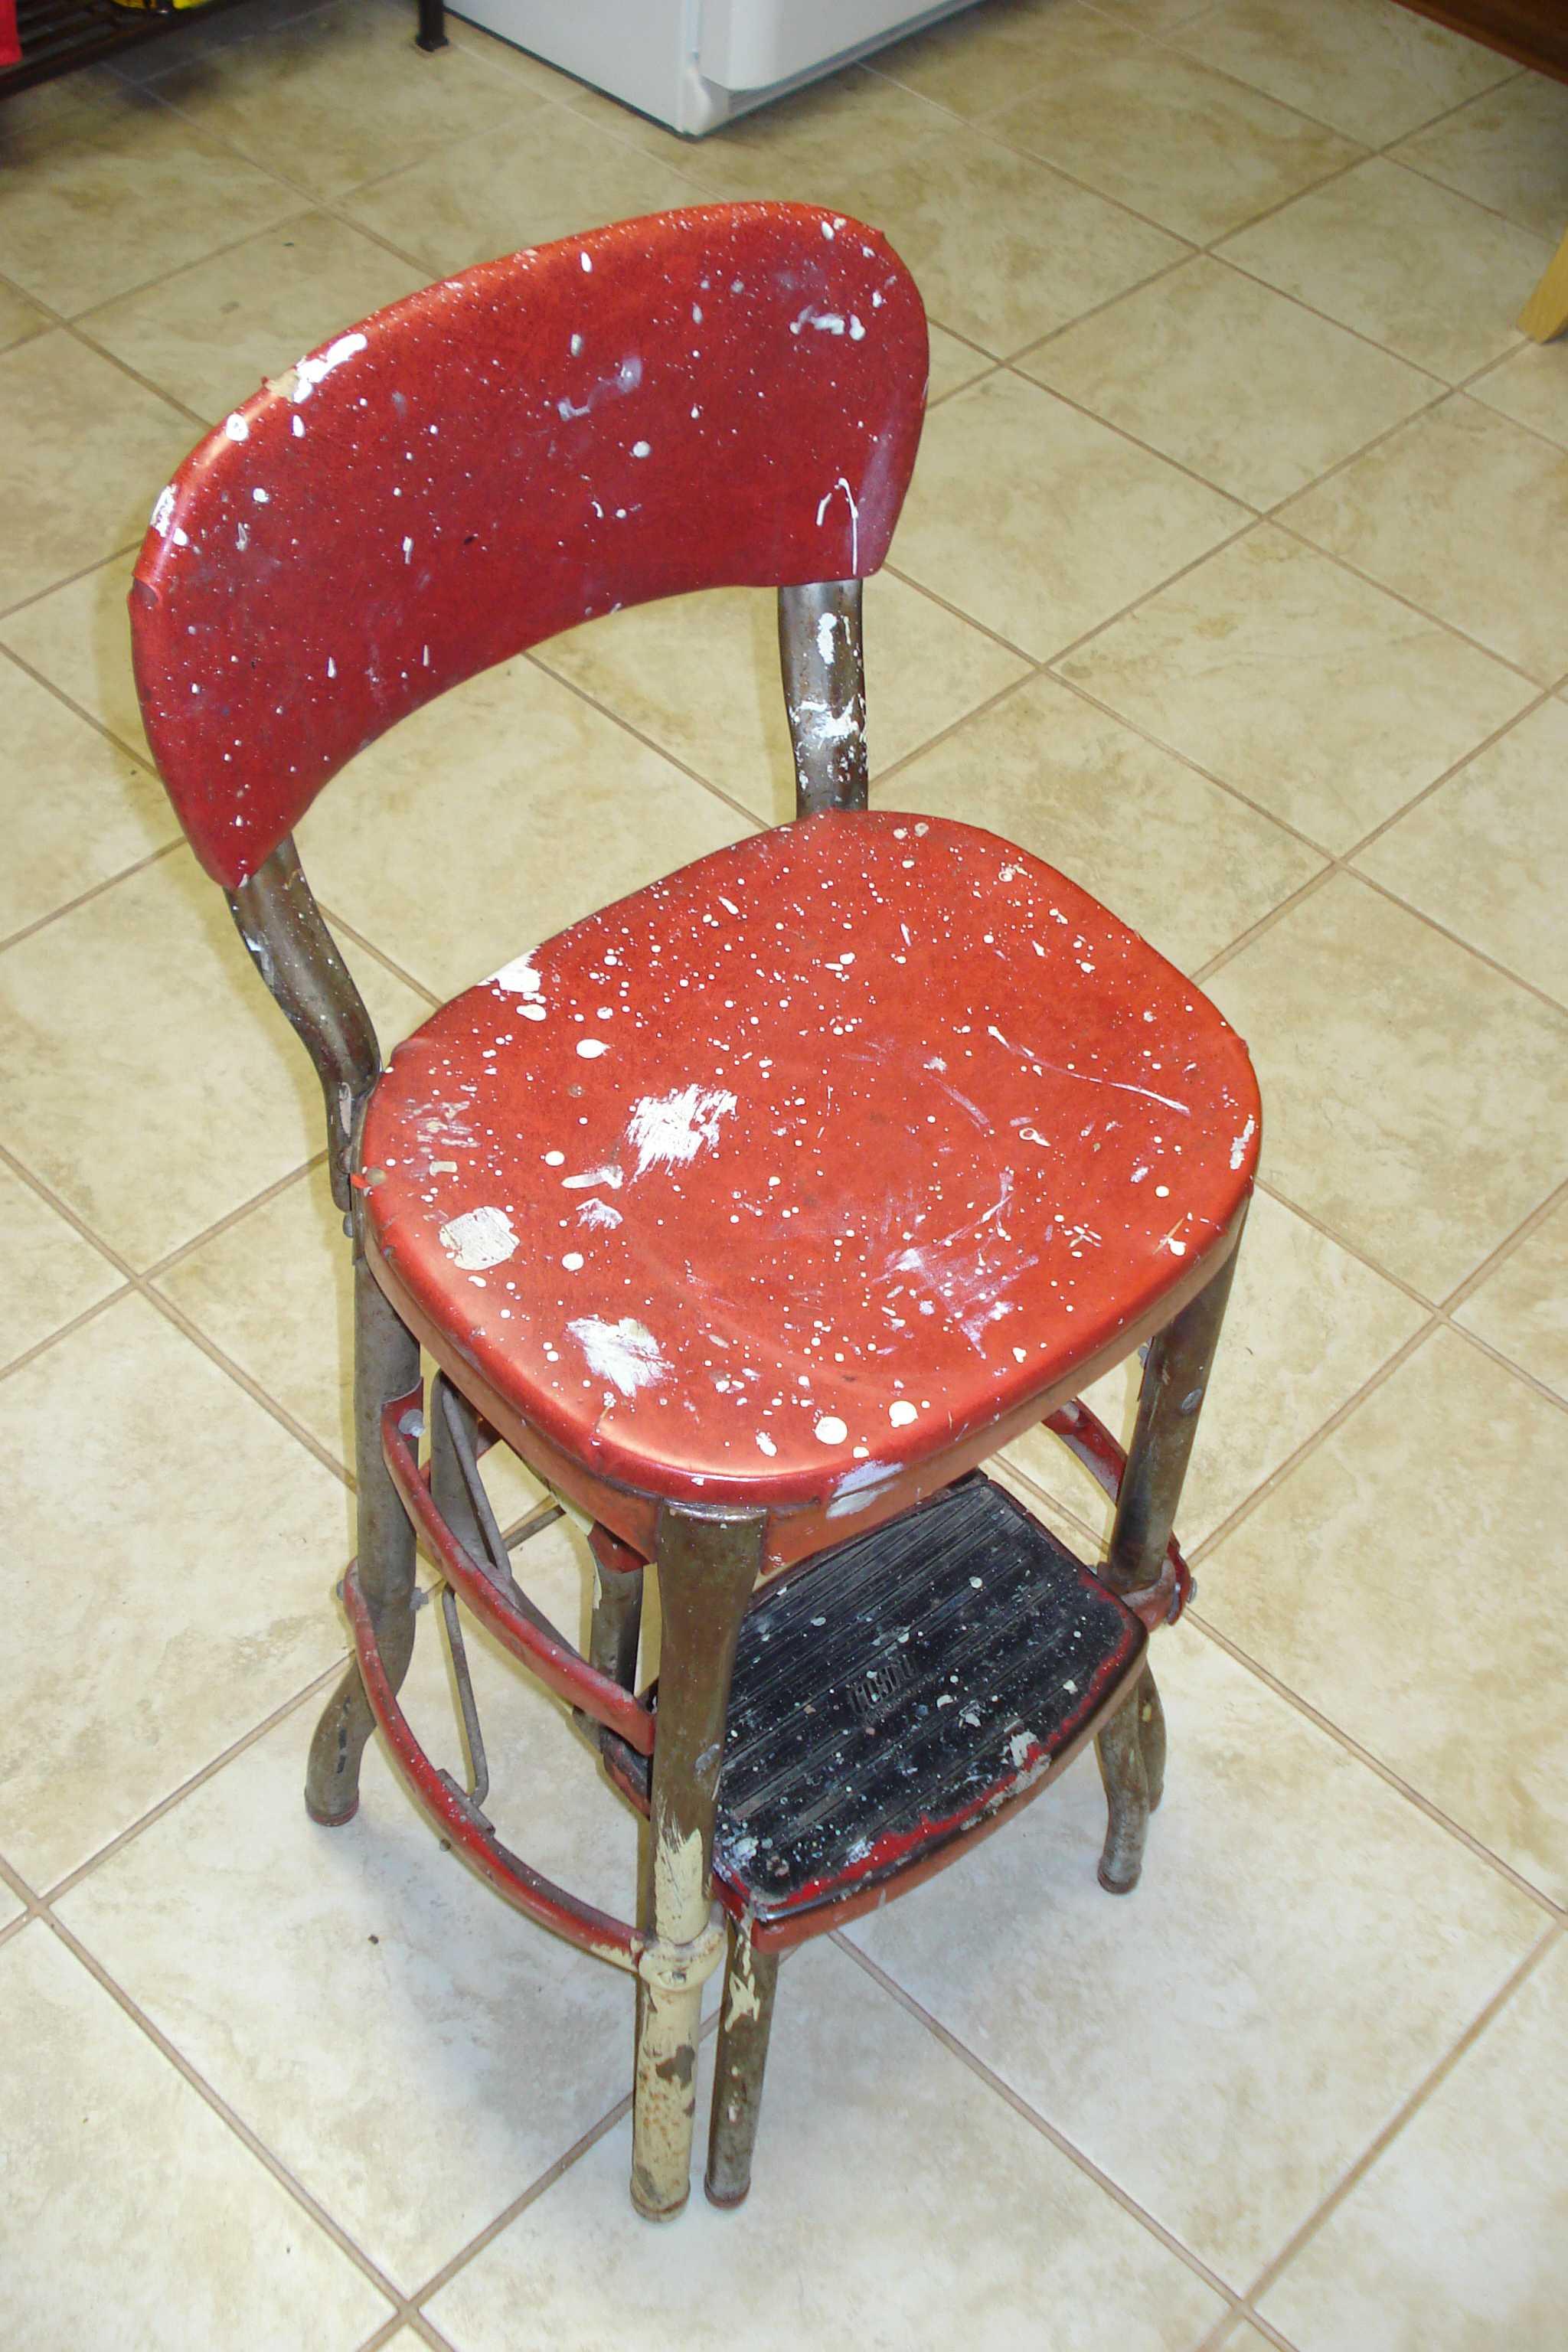 Astonishing Cosco Folding Step Stool Chair Cosco Kitchen Step Stool Spiritservingveterans Wood Chair Design Ideas Spiritservingveteransorg